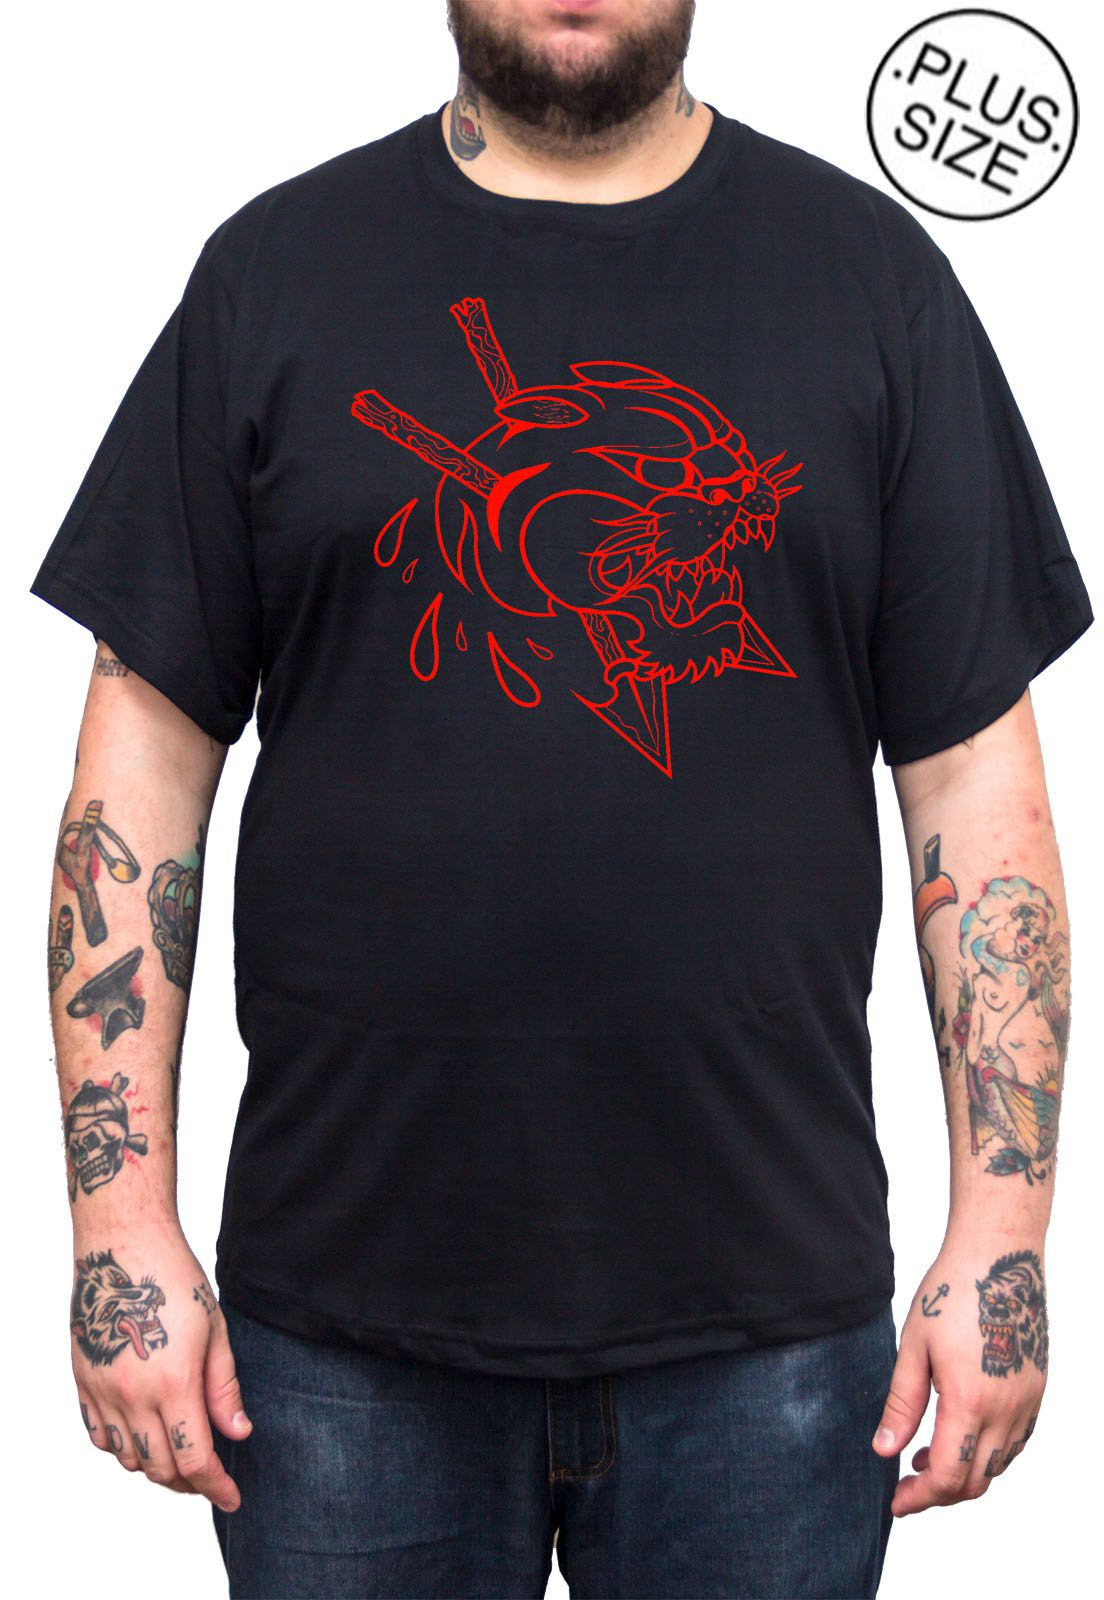 Camiseta Hshop Pantera - Preto - Plus Size - Tamanho Grande XG  - HShop